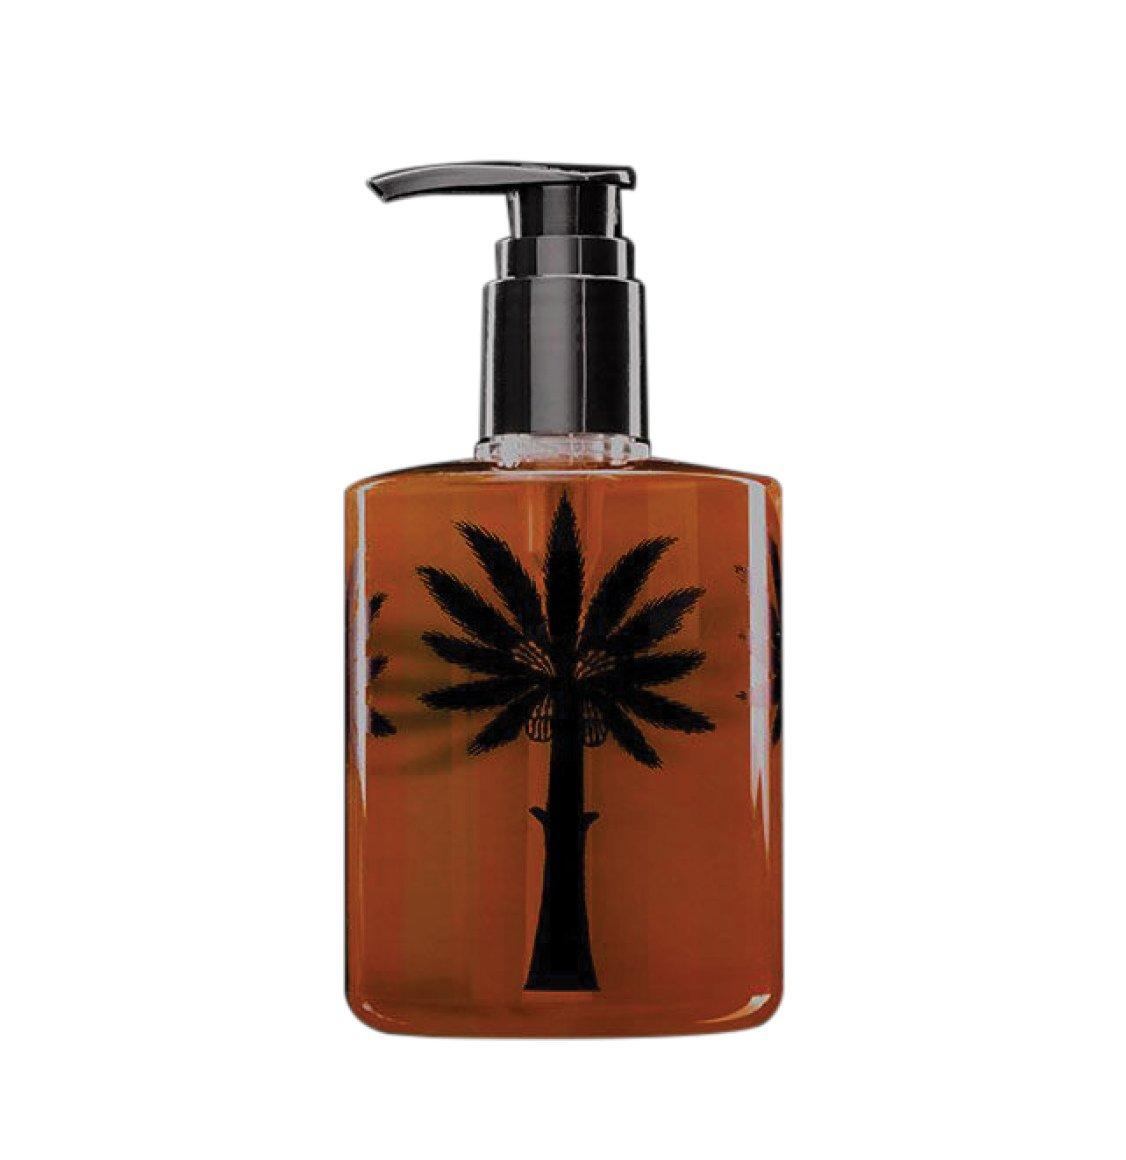 Ortigia Sicilia Orange Blossom Liquid Soap 300ml